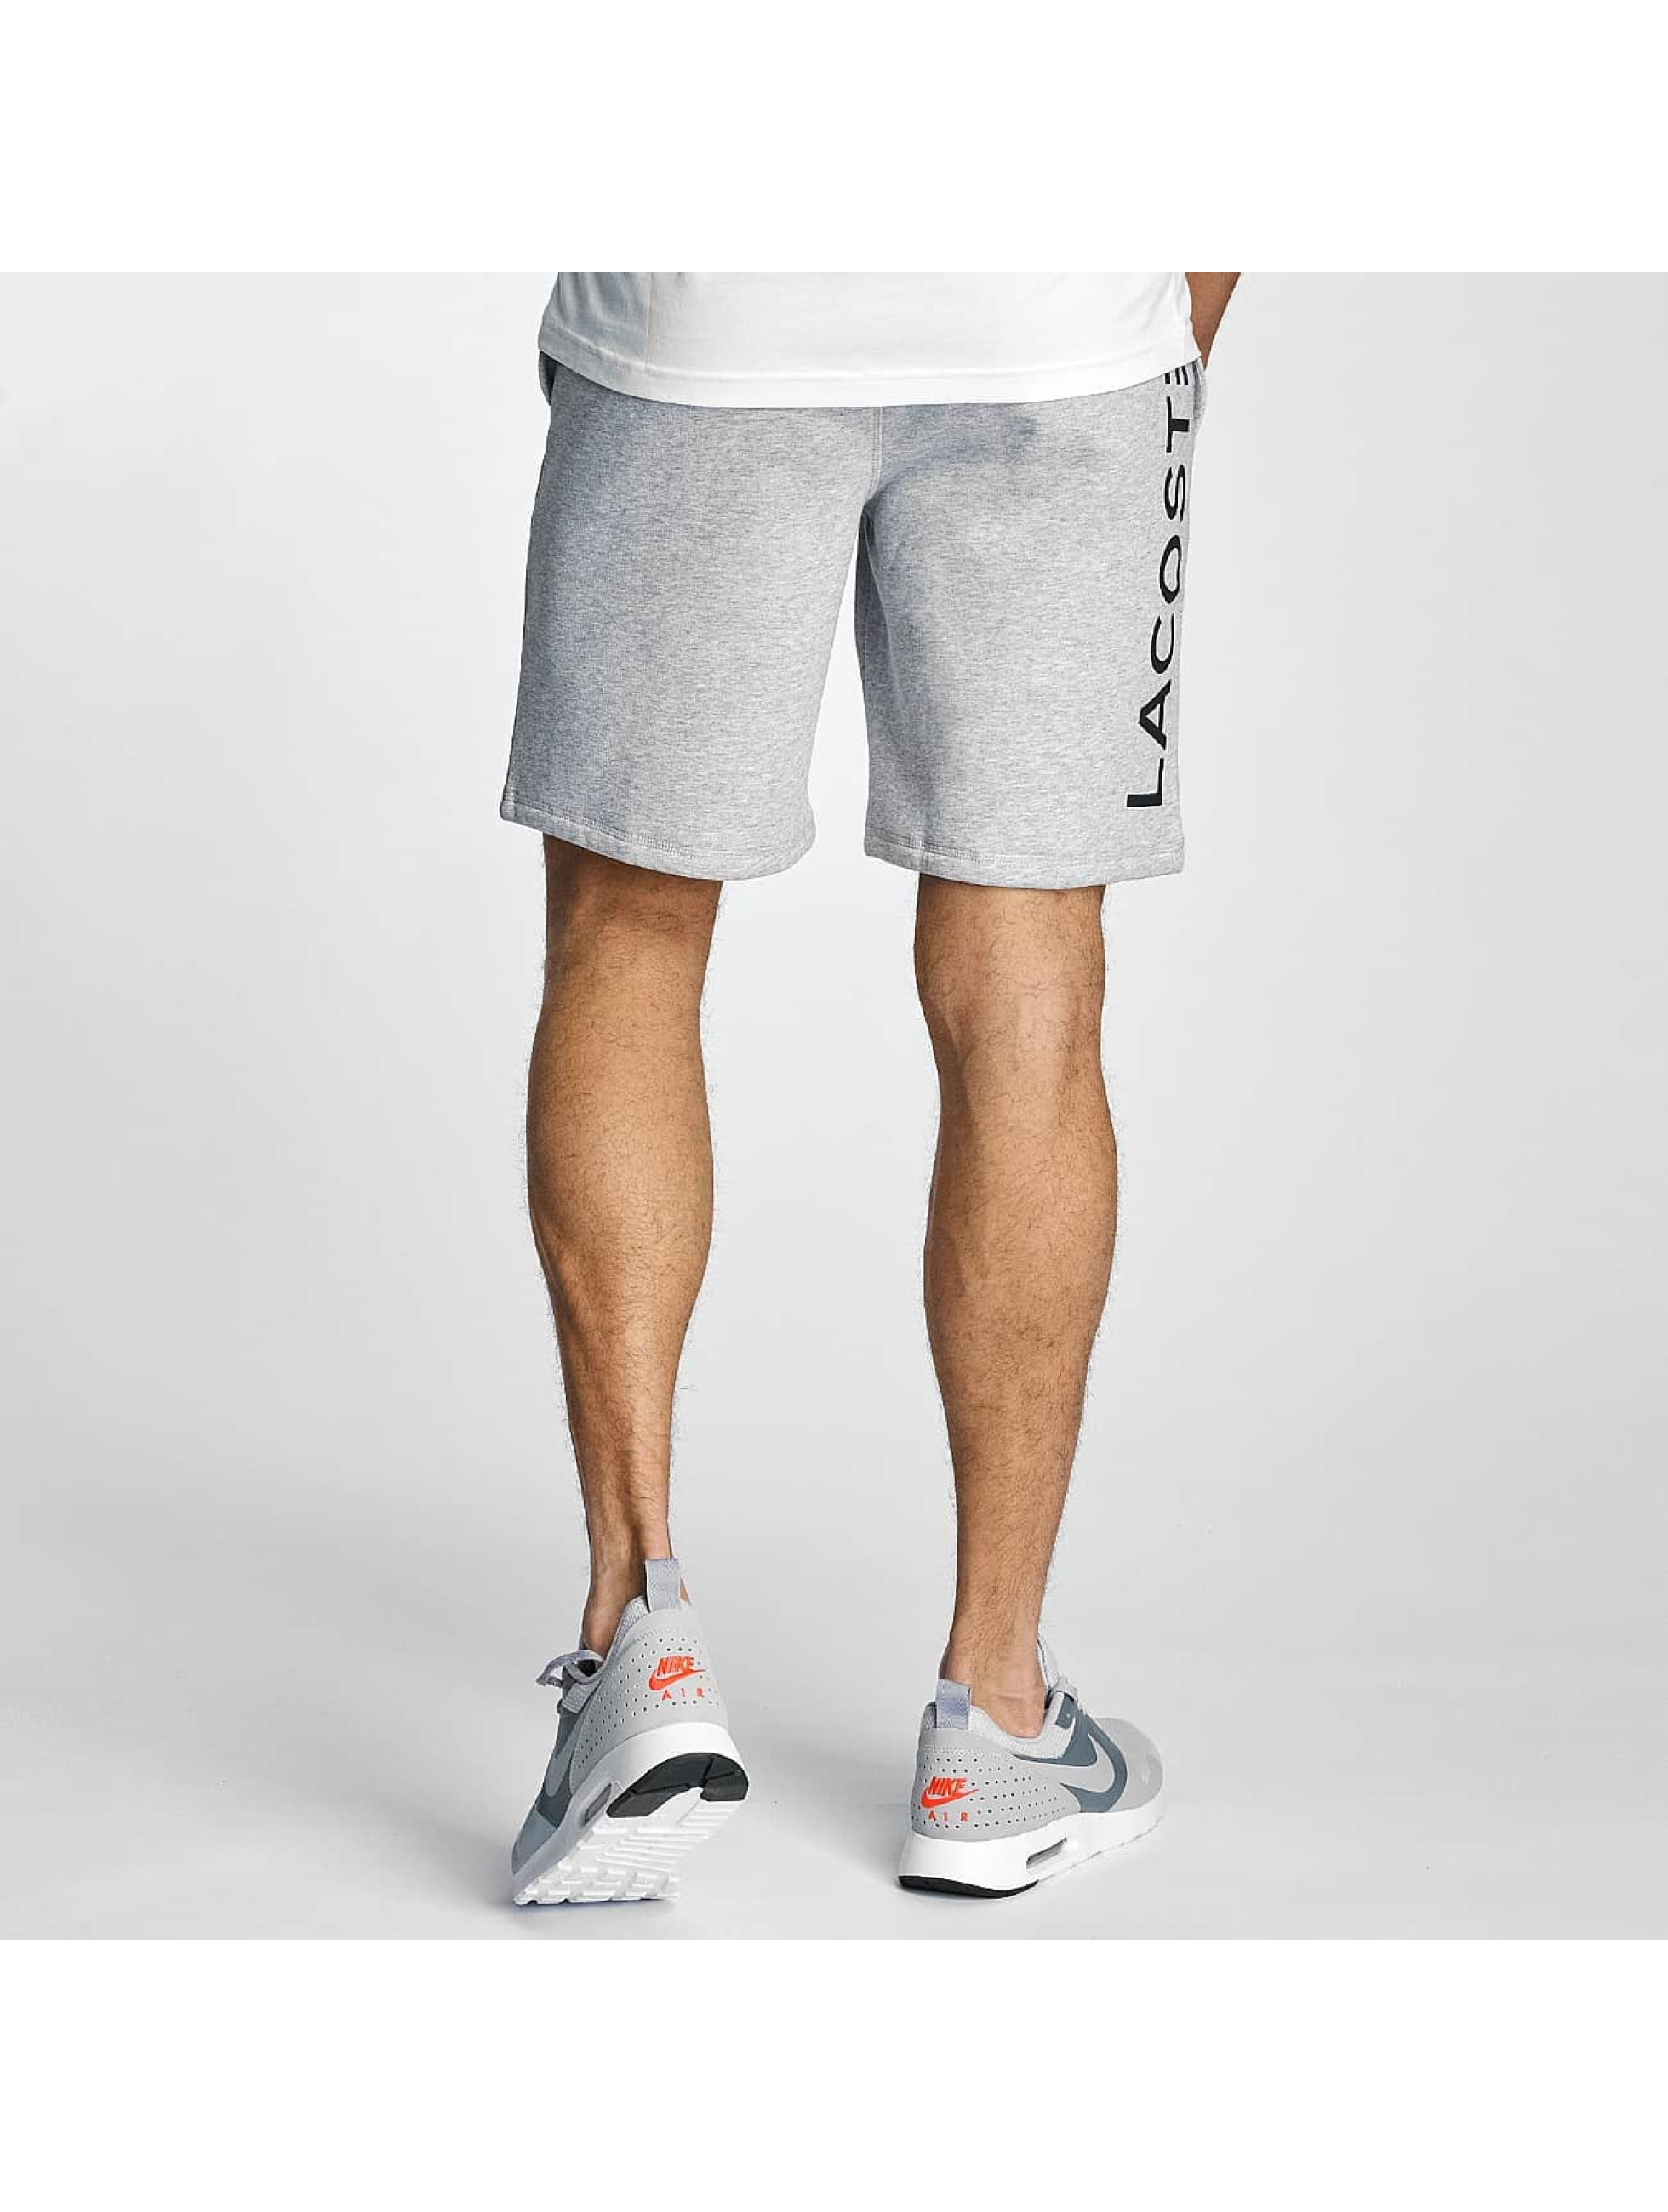 Lacoste Shorts Classic grau